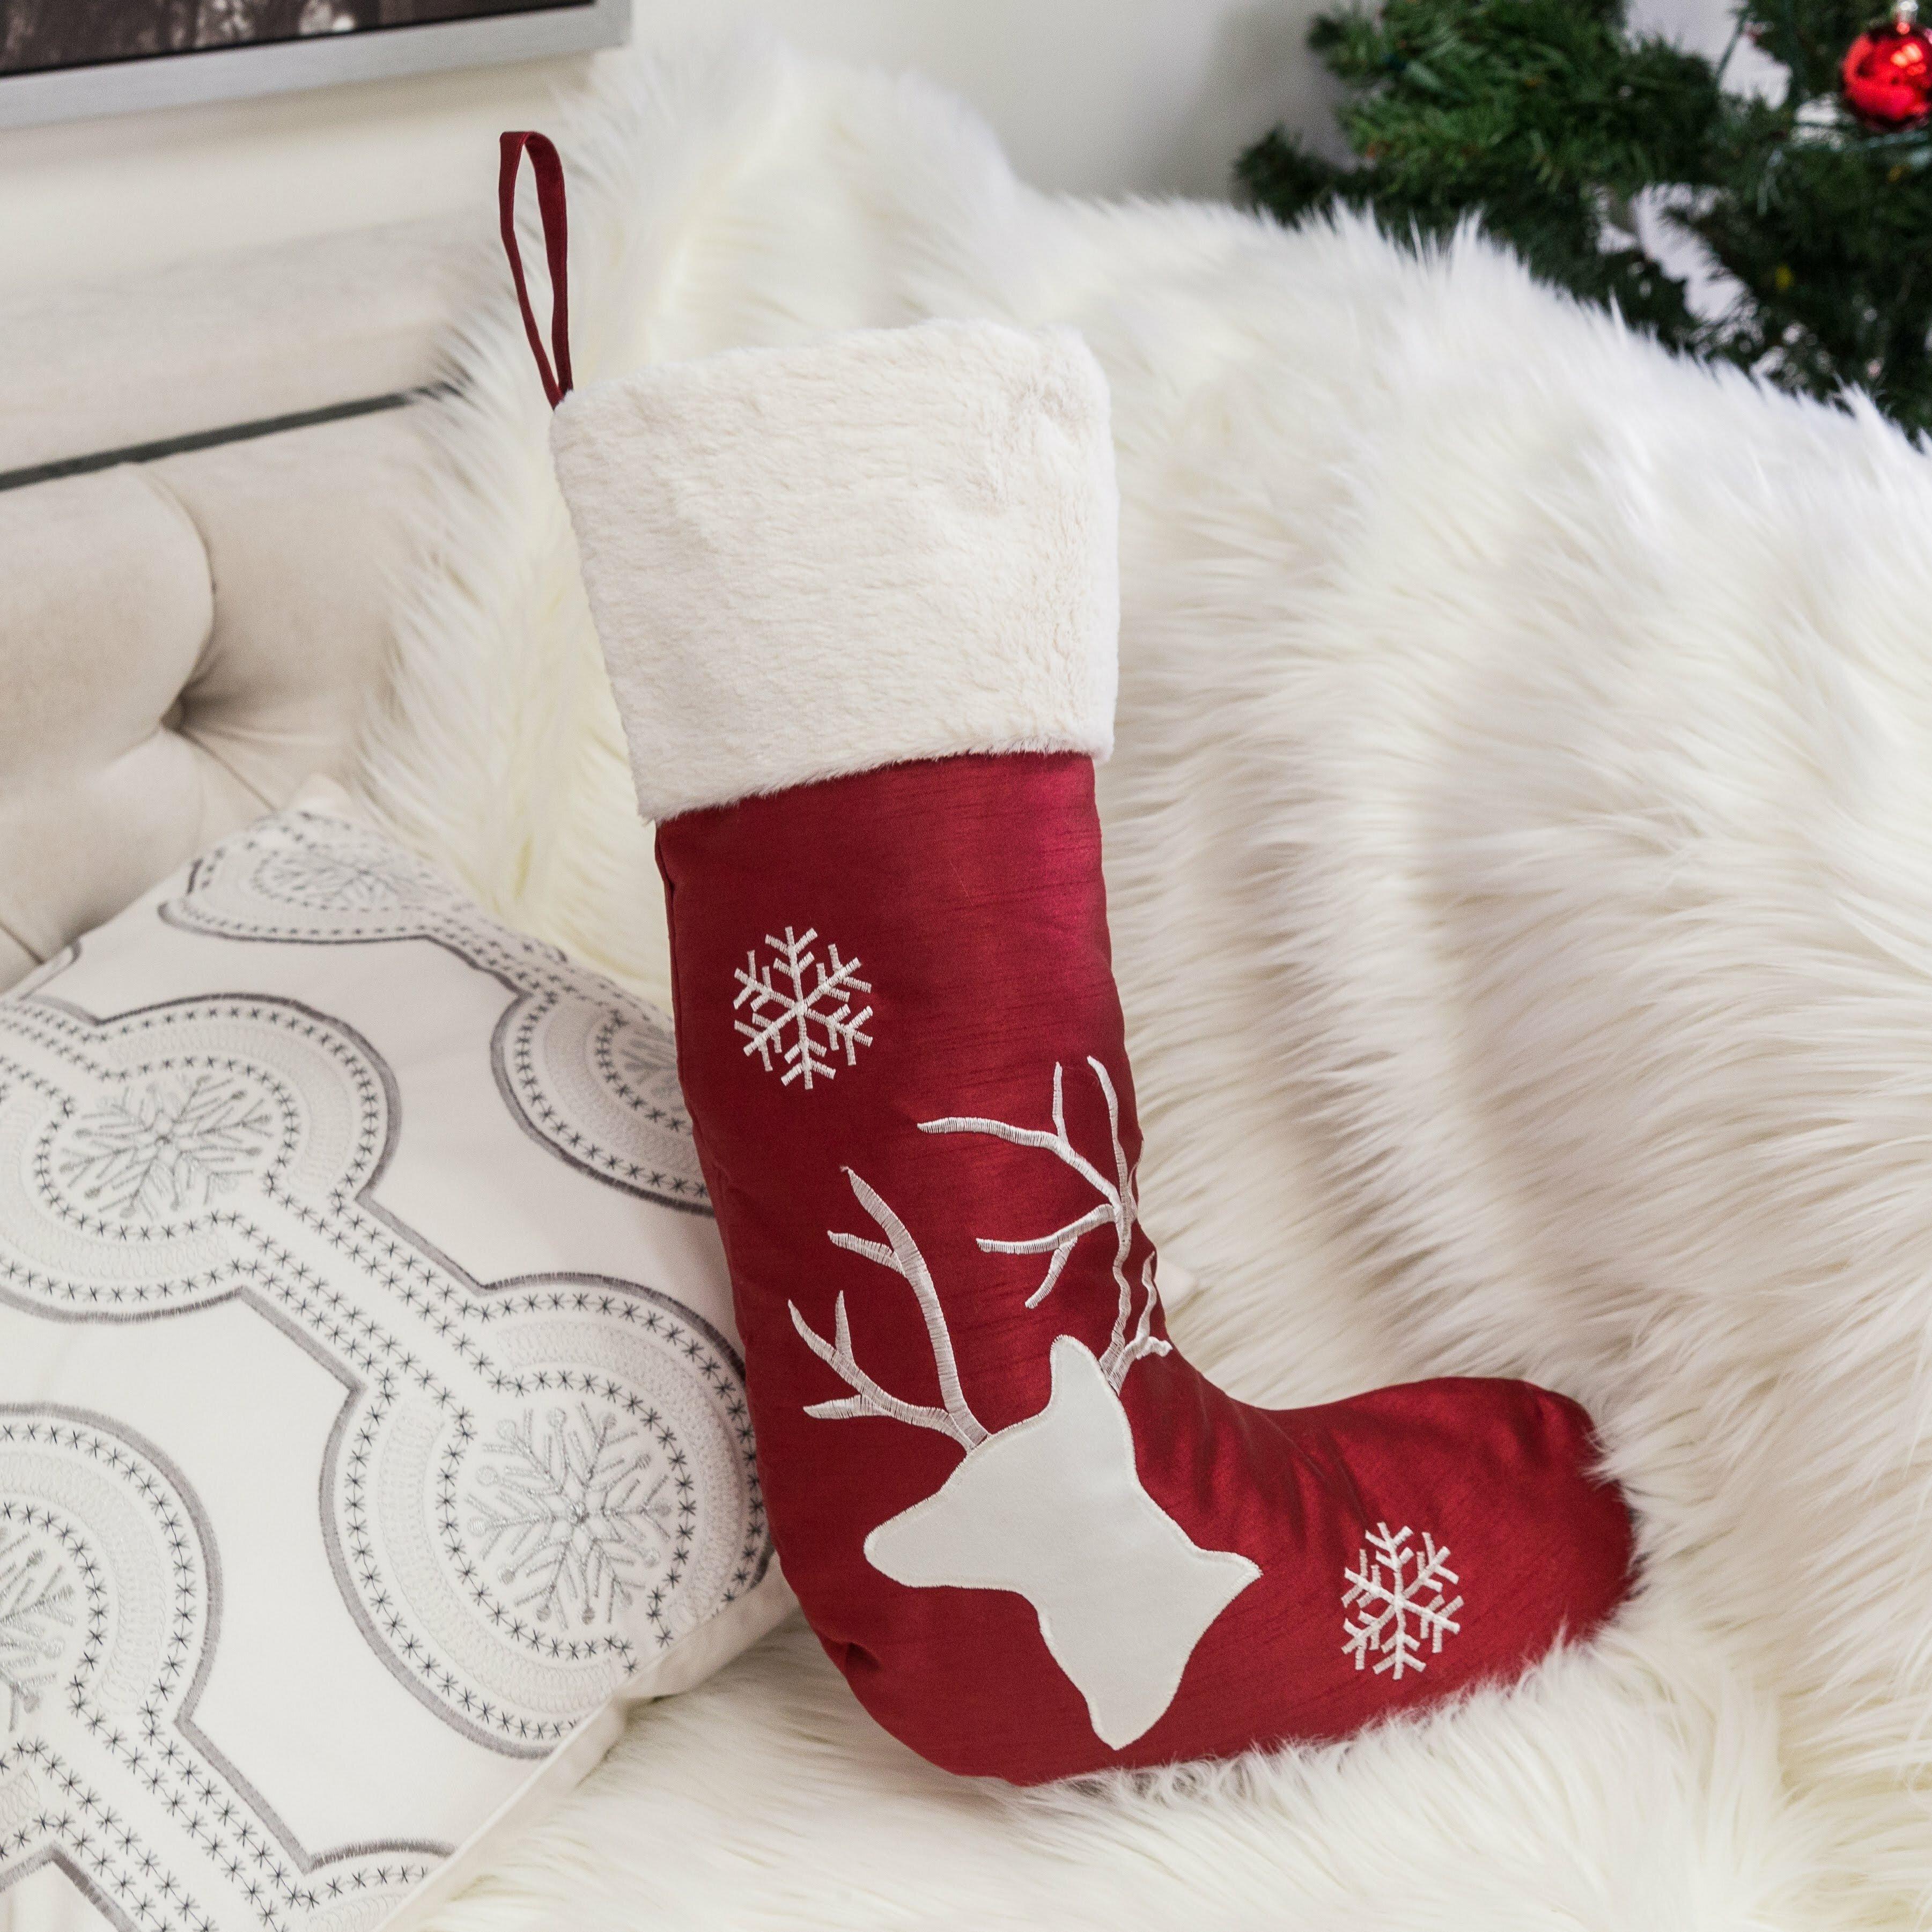 Christmas Red Snowflake Fluffy Soft /& Warm Socks Bed Sock Xmas Fun Gift